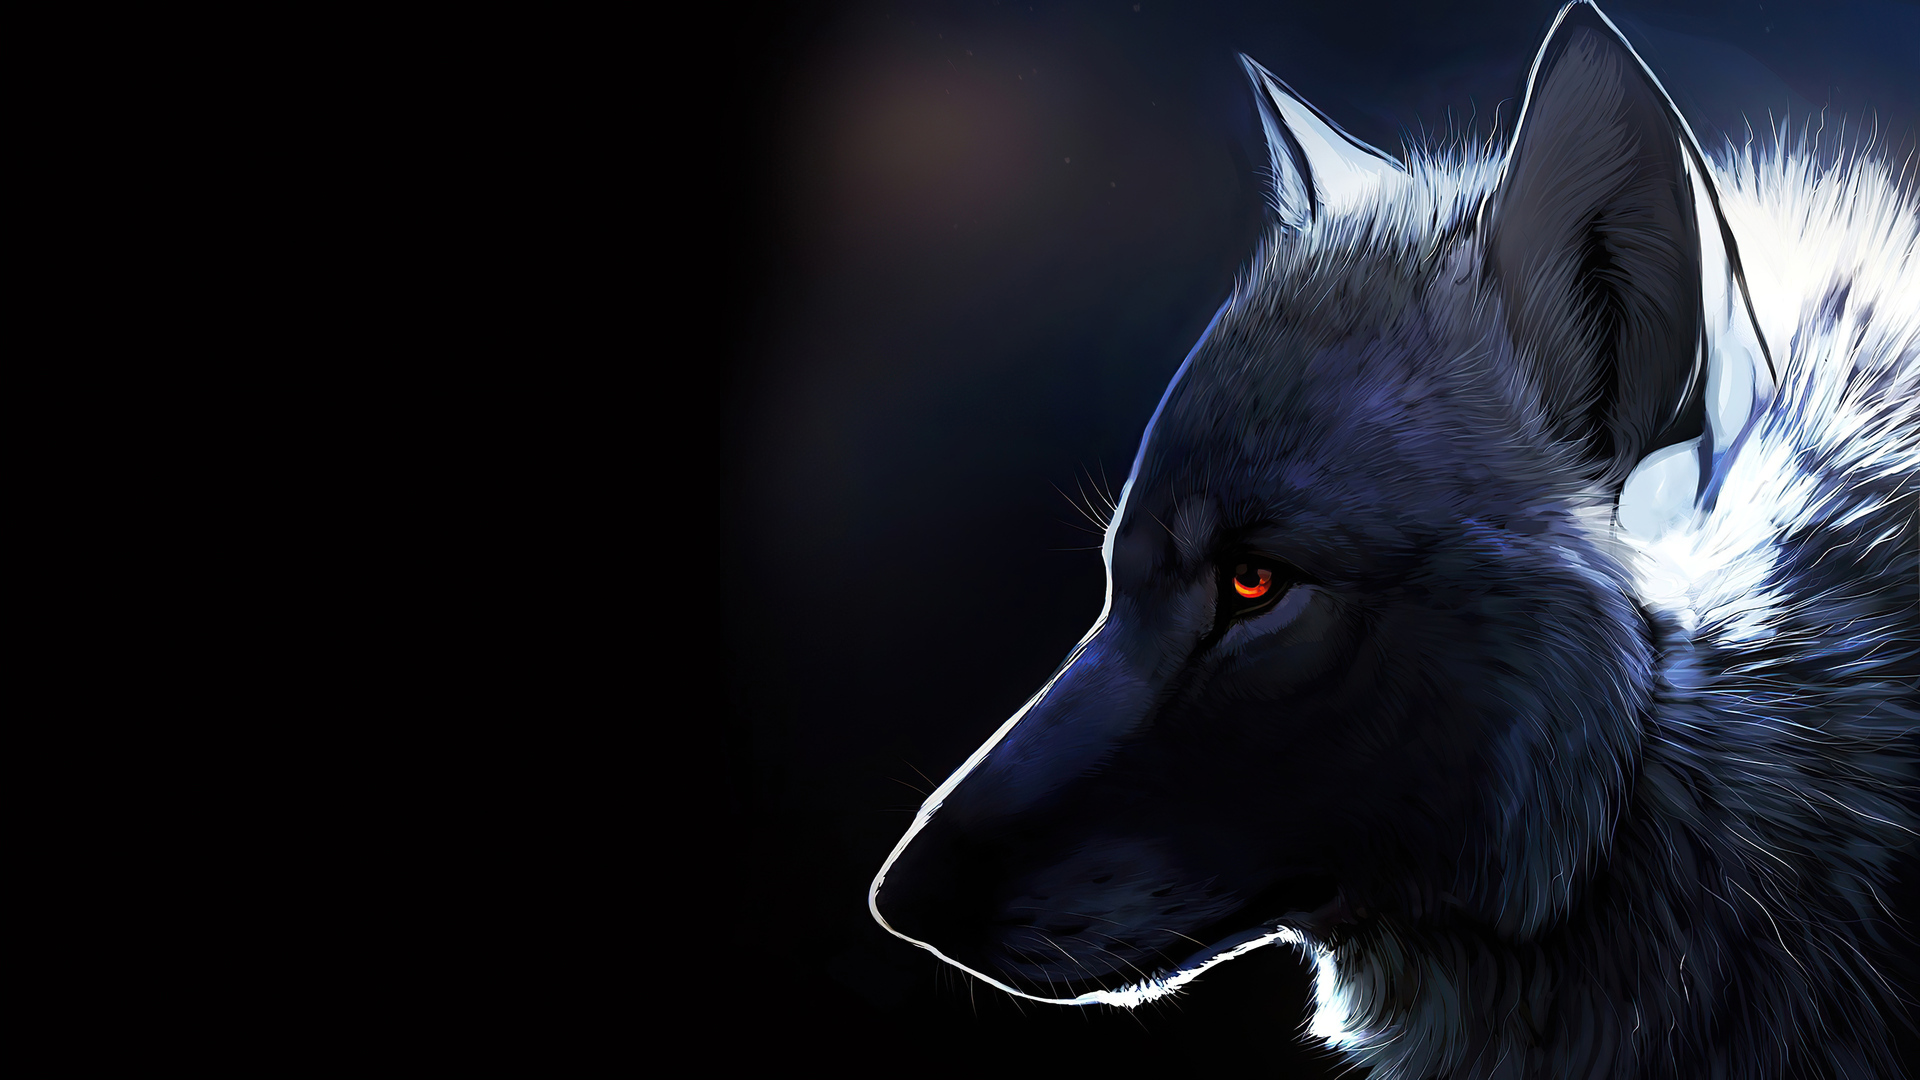 wolf-glowing-eyes-4k-ff.jpg